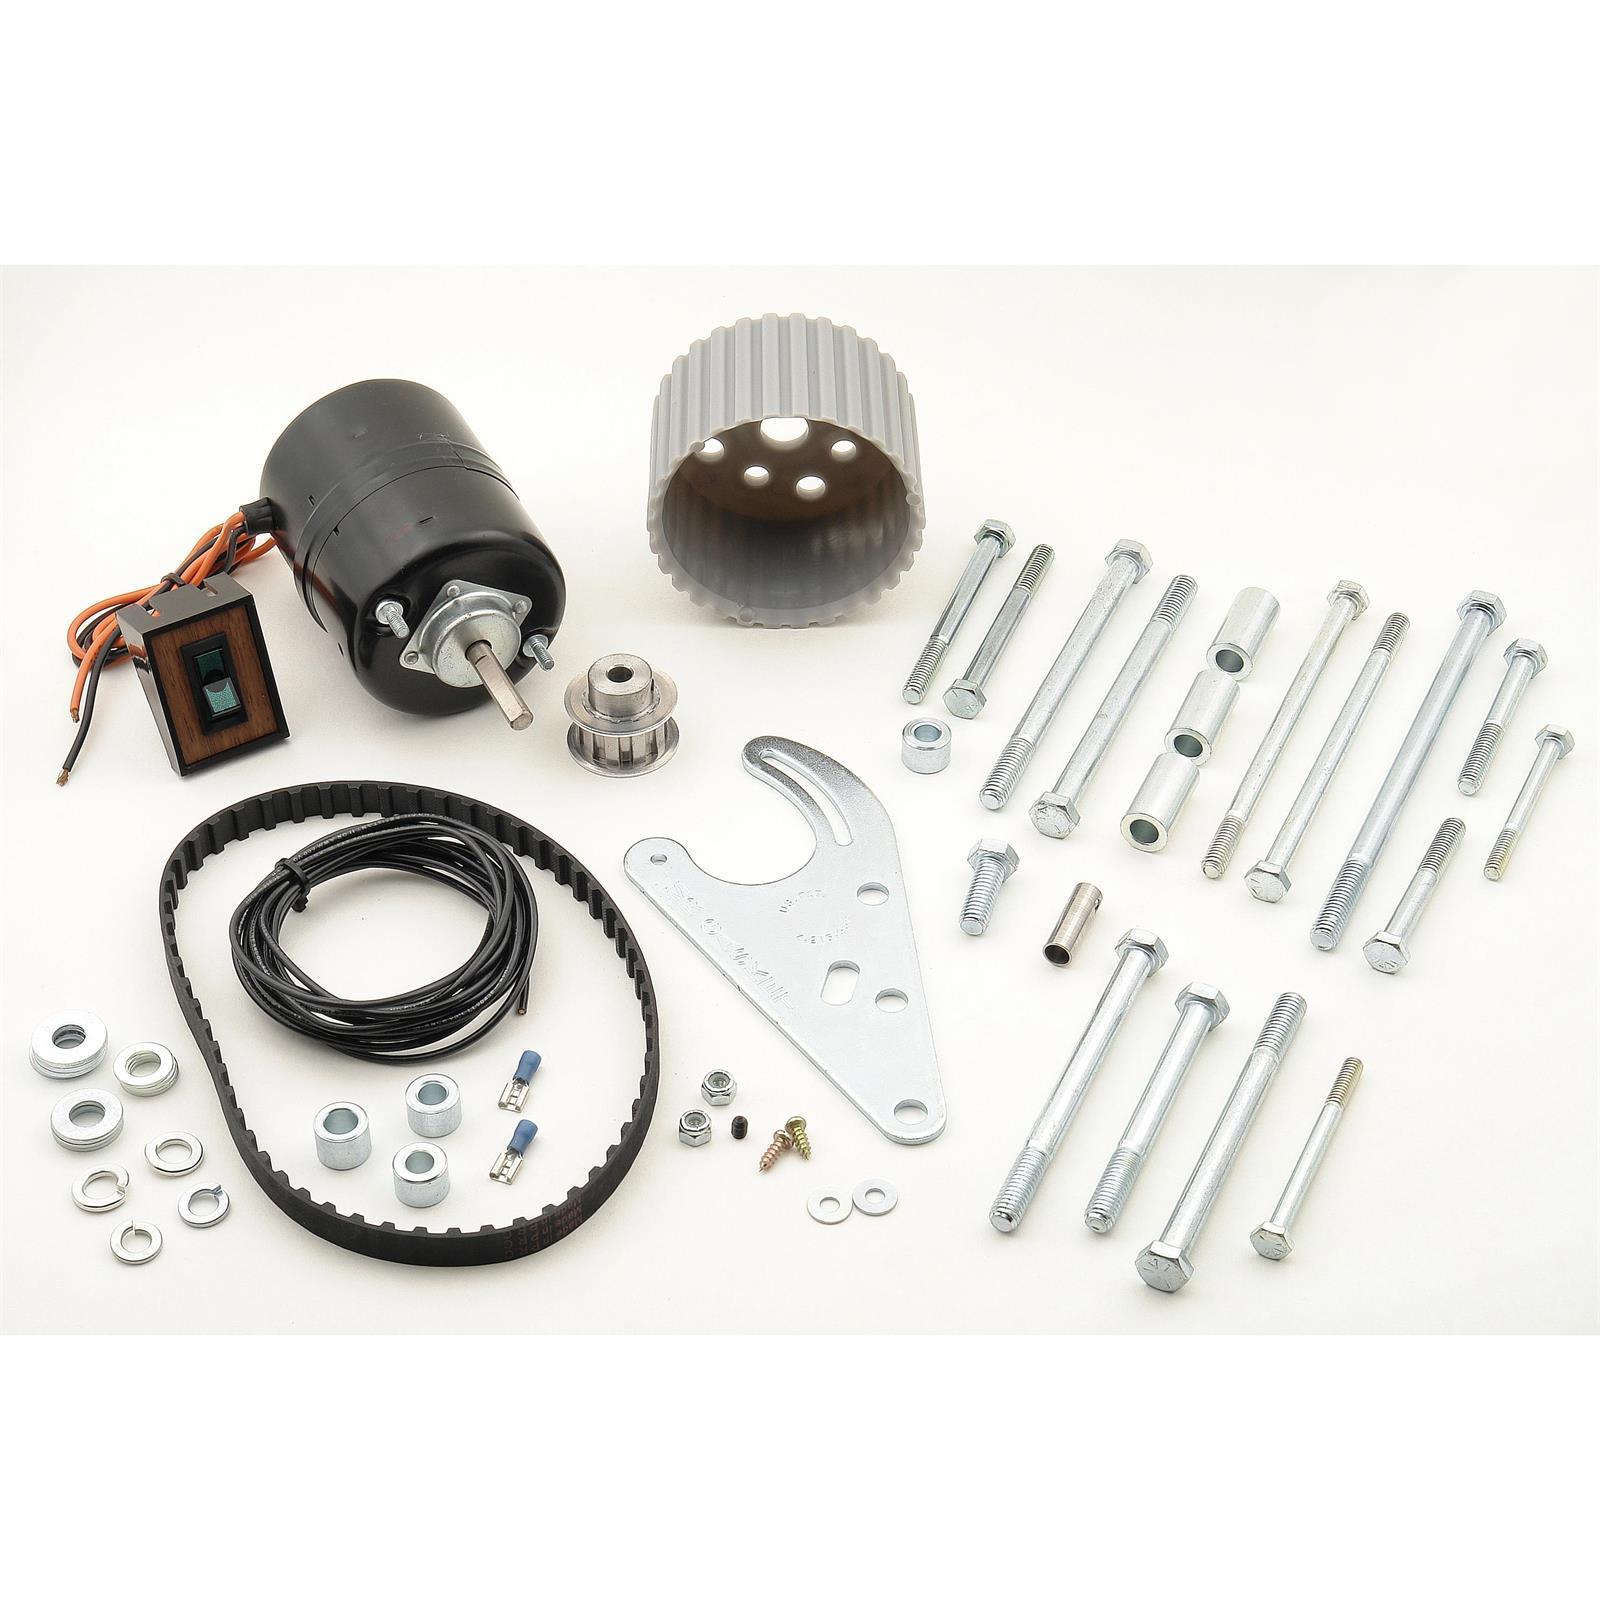 Mr Gasket 4333 Electric Water Pump Drive Kit